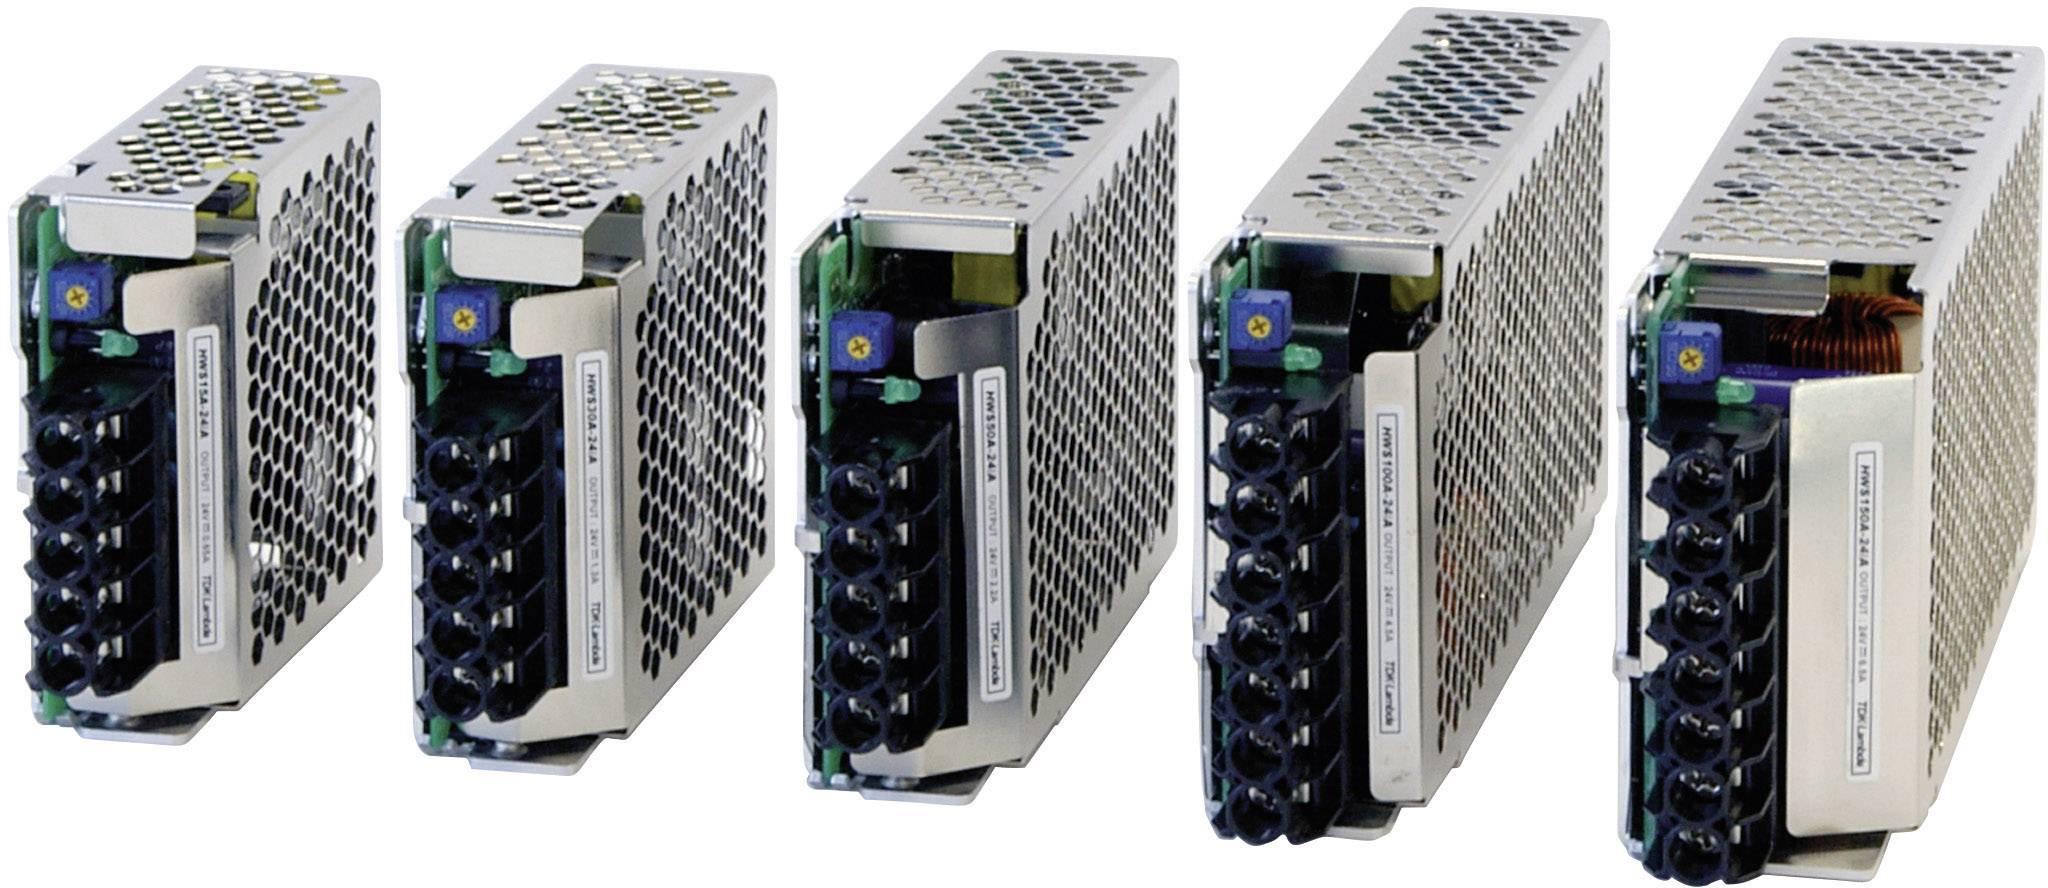 Zabudovateľný napájací zdroj TDK-Lambda HWS-30A-3/A, 3,3 V, 20 W